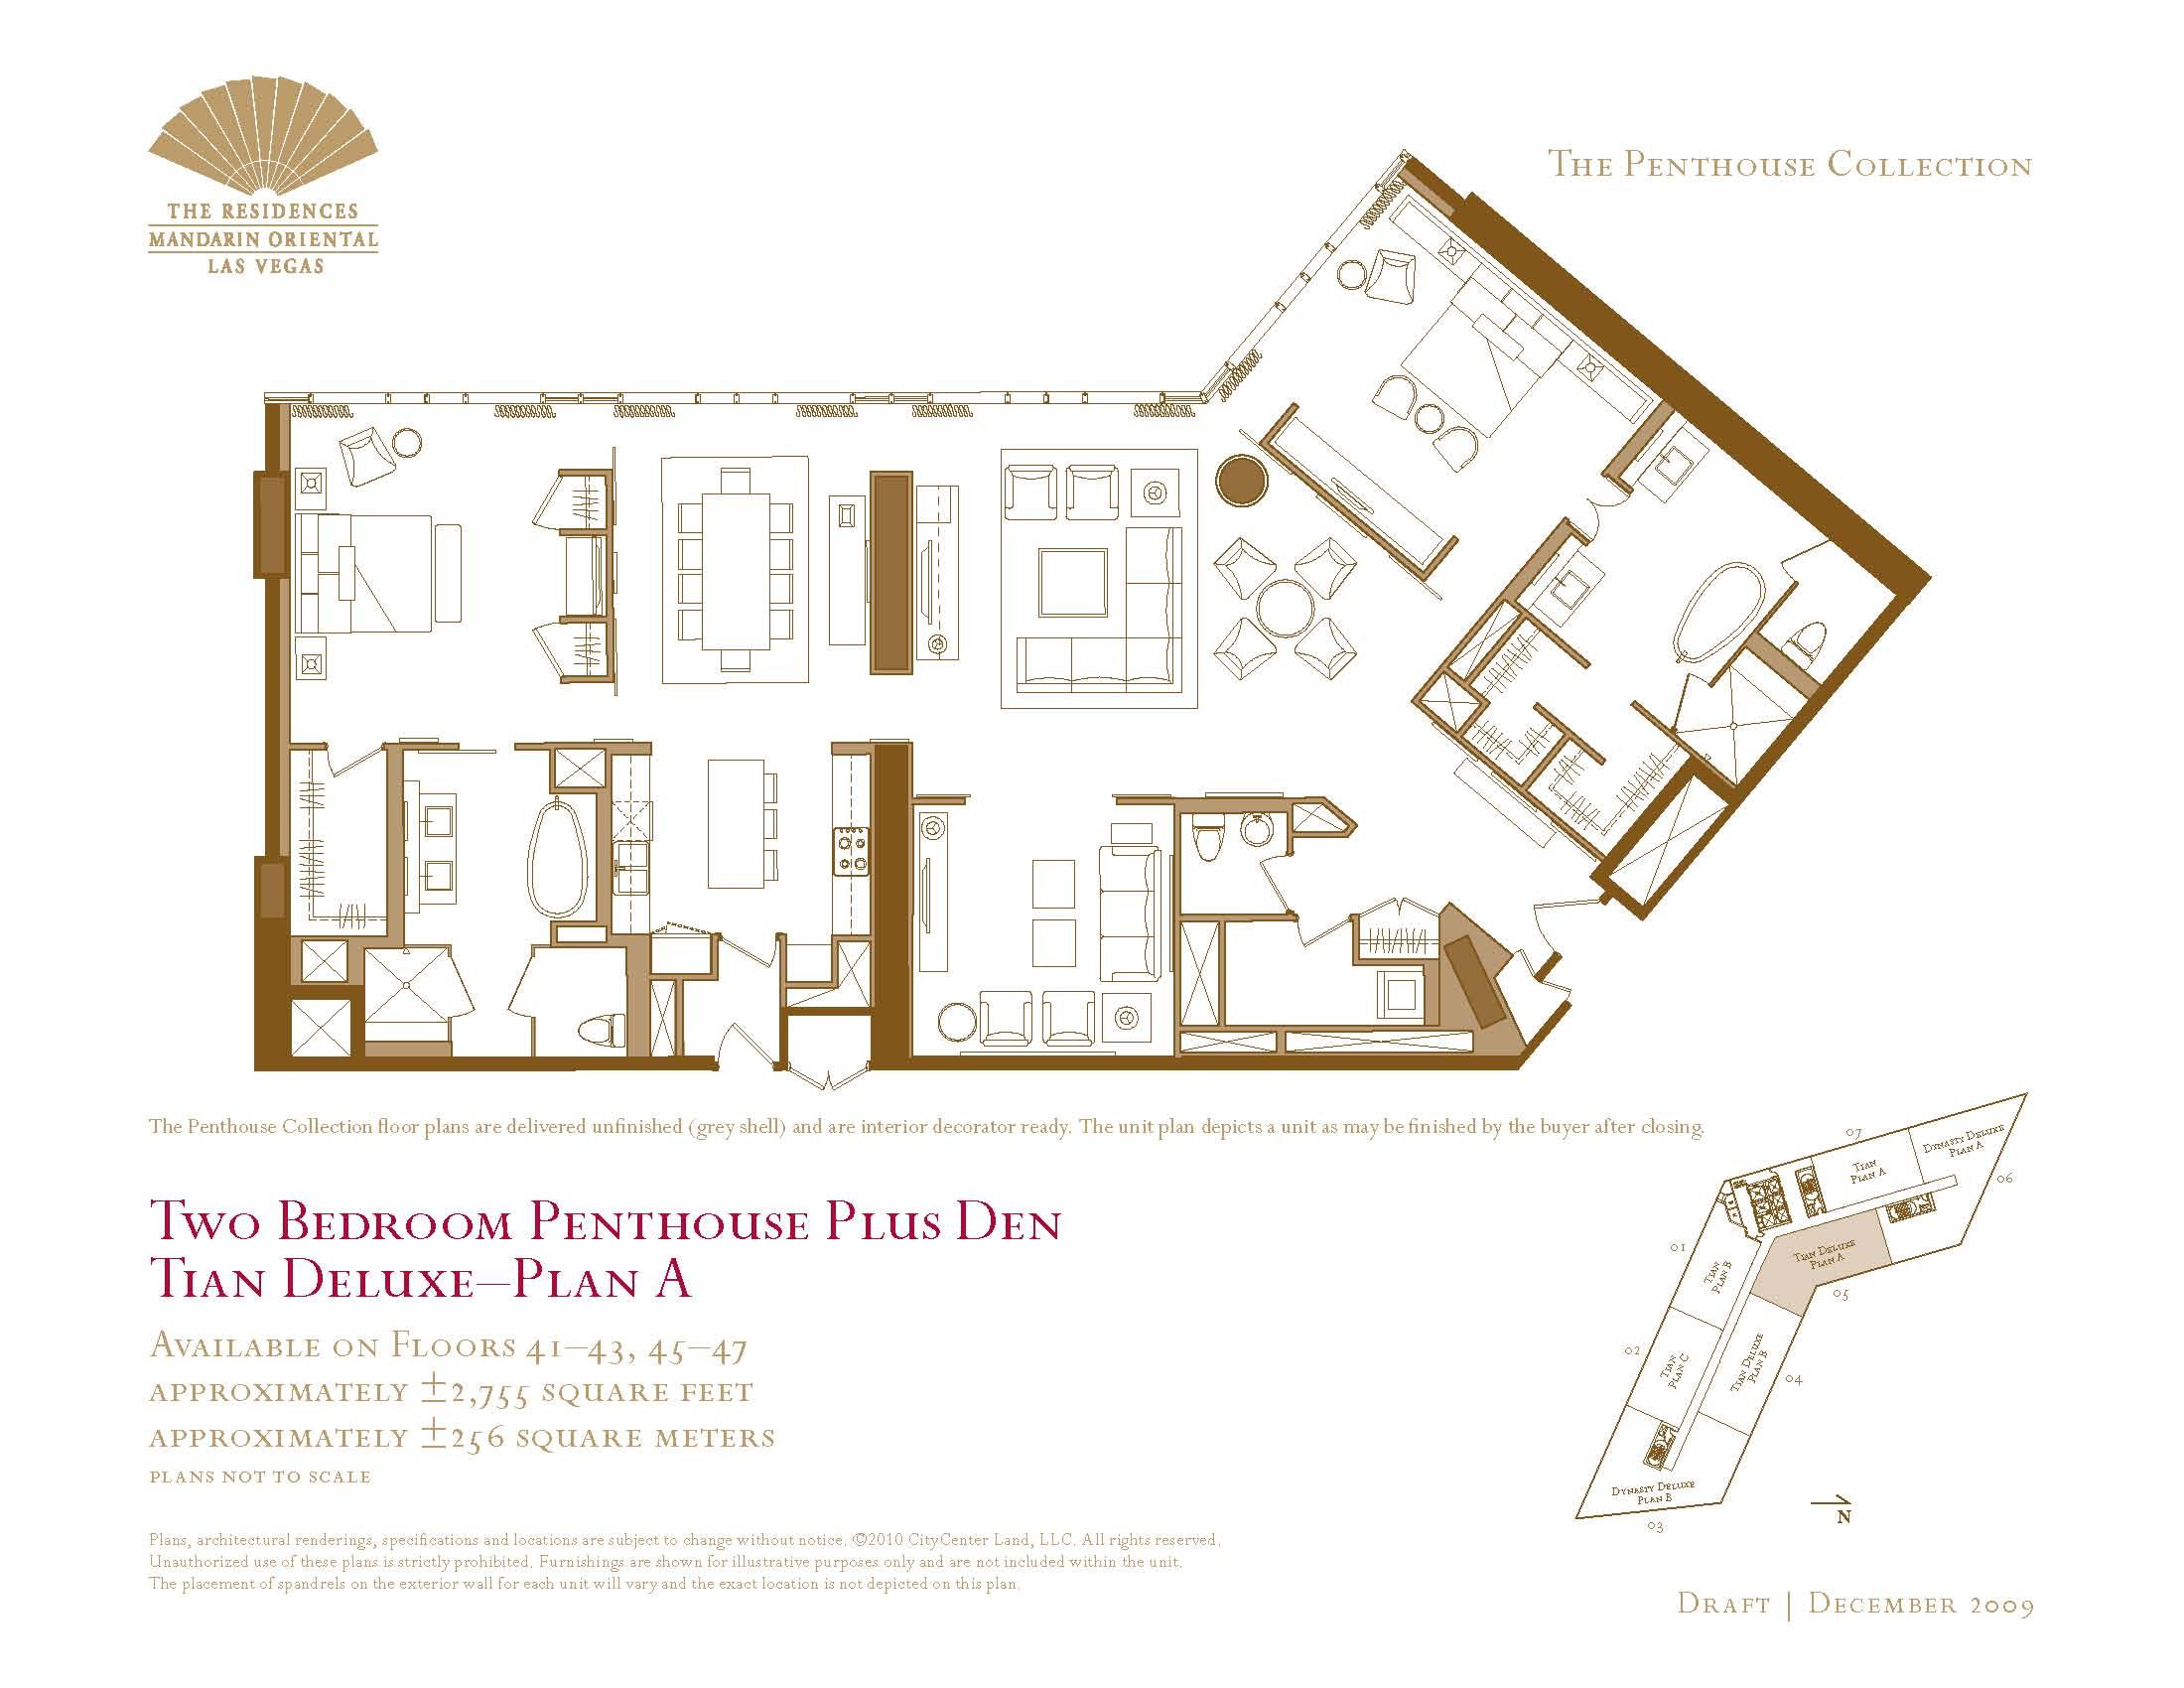 Two bedroom plus den penthouse floor plans the mandarin for Las vegas home floor plans